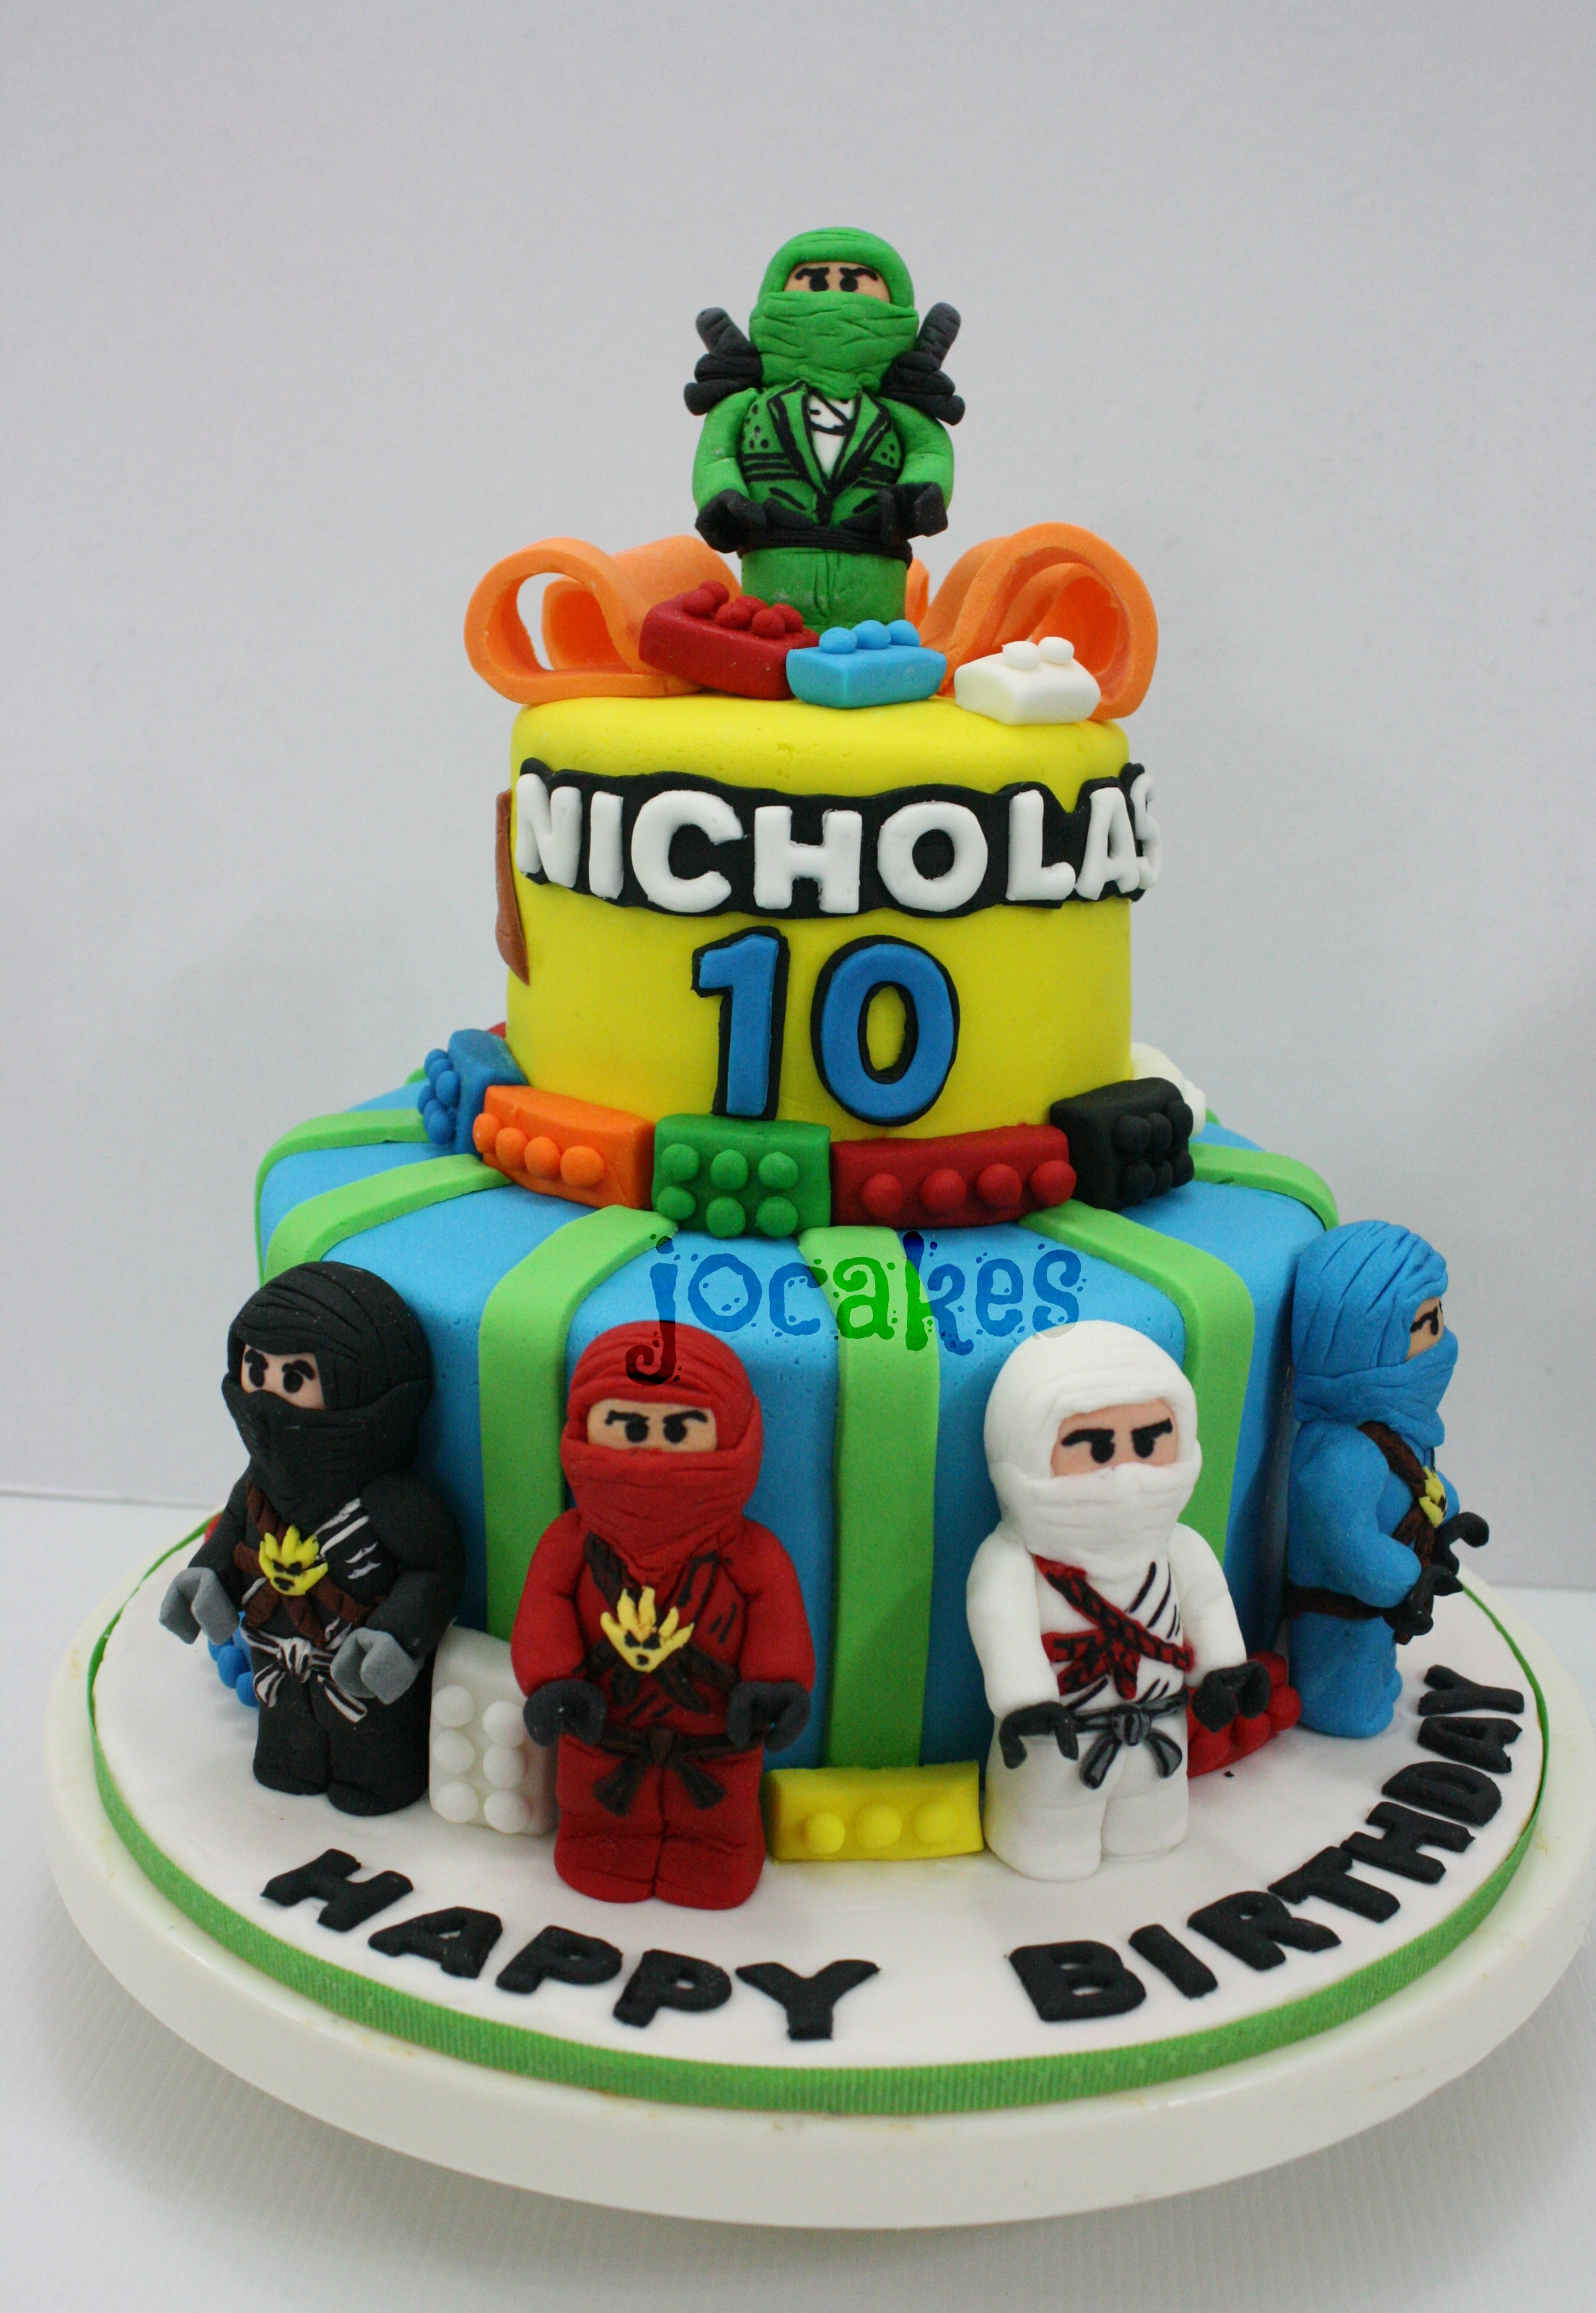 Best ideas about Ninjago Birthday Cake . Save or Pin lego ninjago cake jocakes Now.